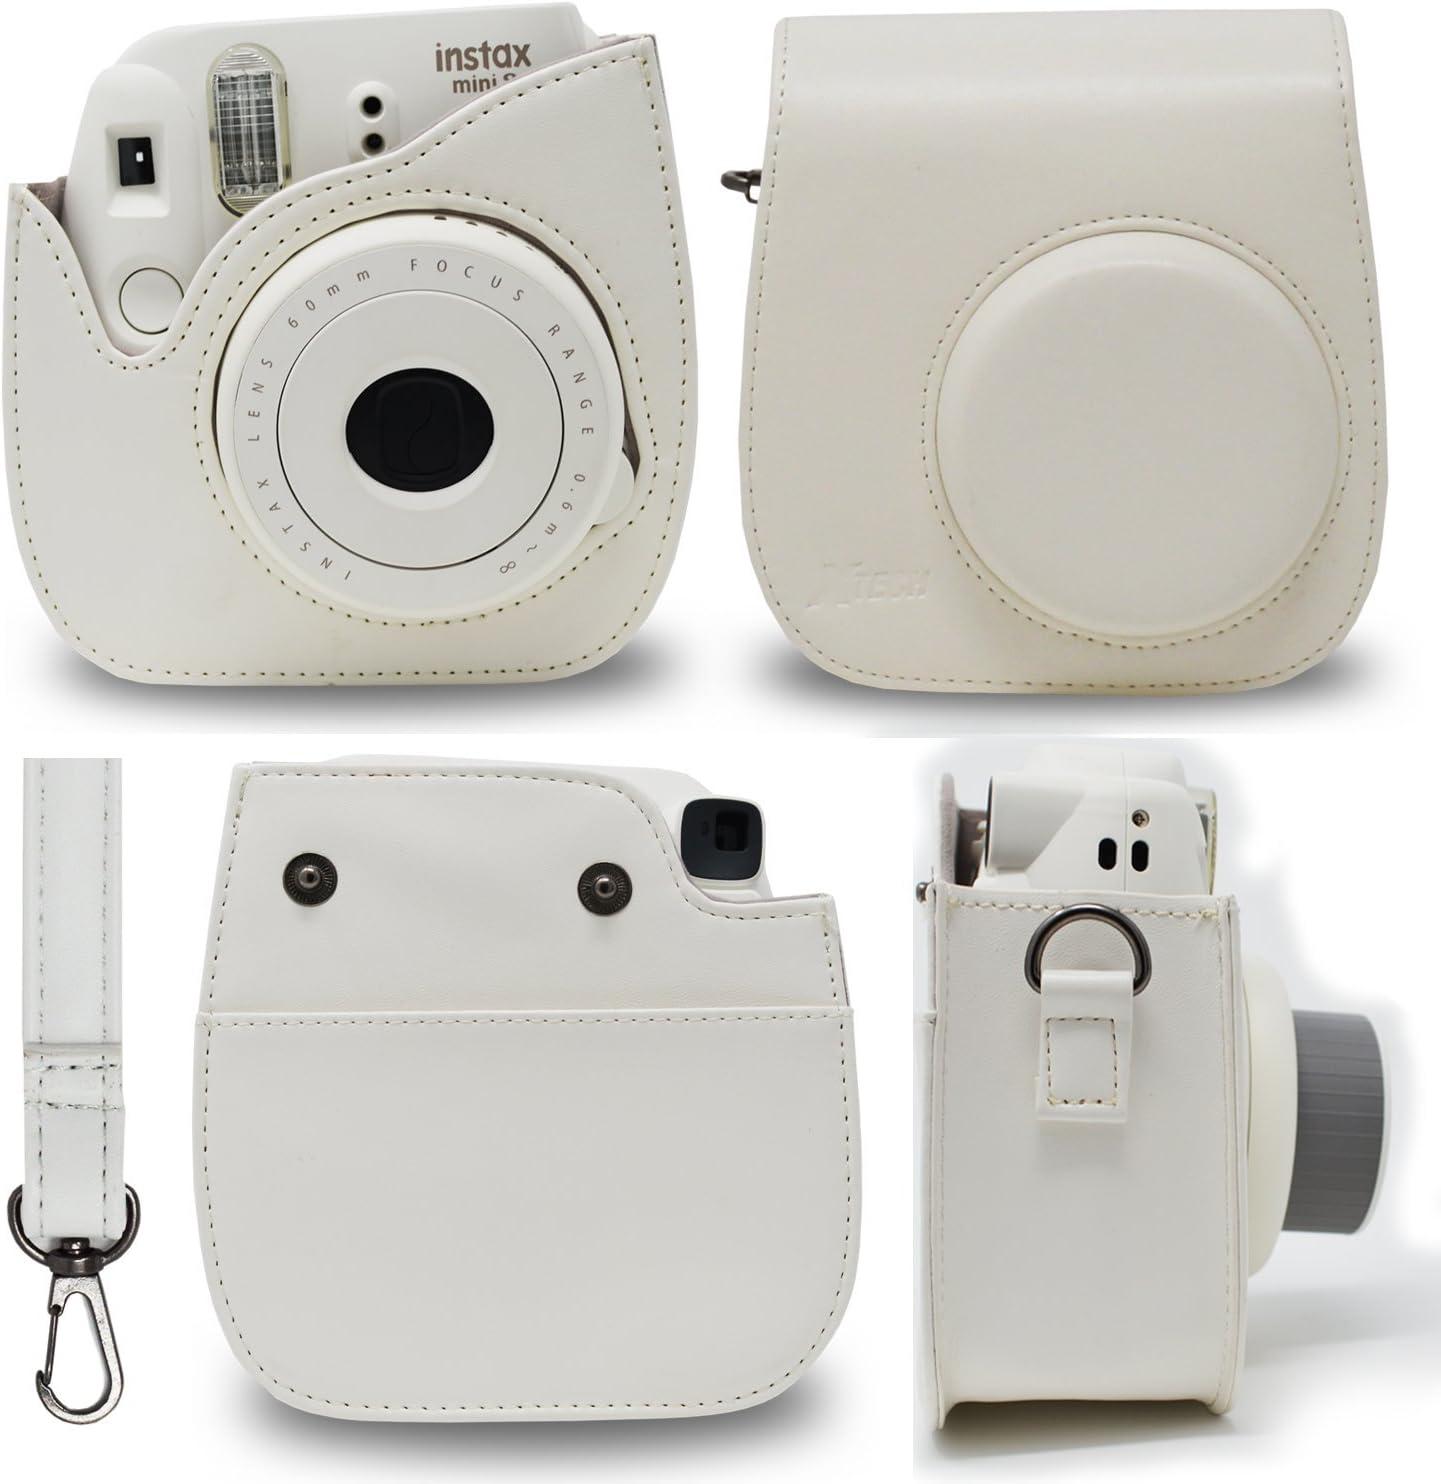 FujiFilm Instax Mini 9 Instant Camera SMOKEY WHITE Instax Album 20 Sheets 20 EMOJI stickers MORE Fun Frames 4 Colored Filters 60 Colorful Stickers Fuji INSTAX Film + Custom Camera Case